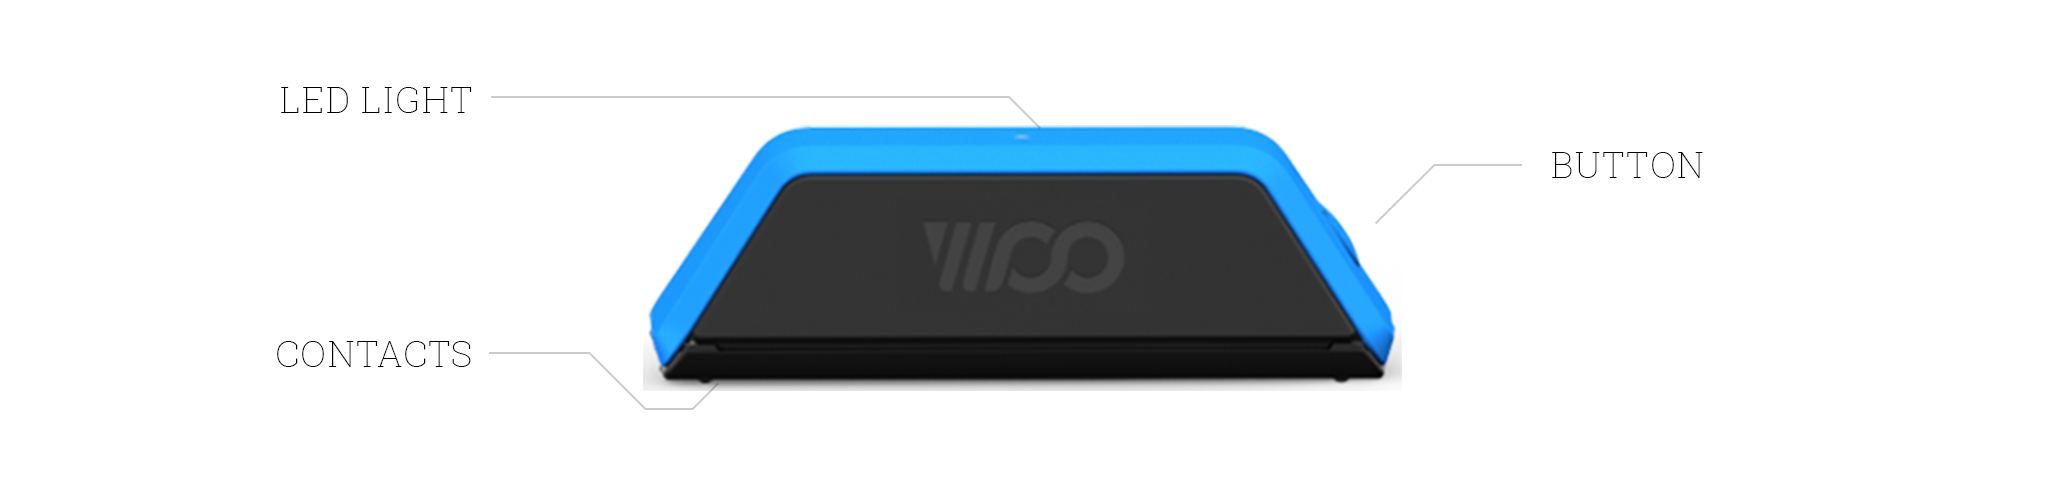 Sensor ('WOO')